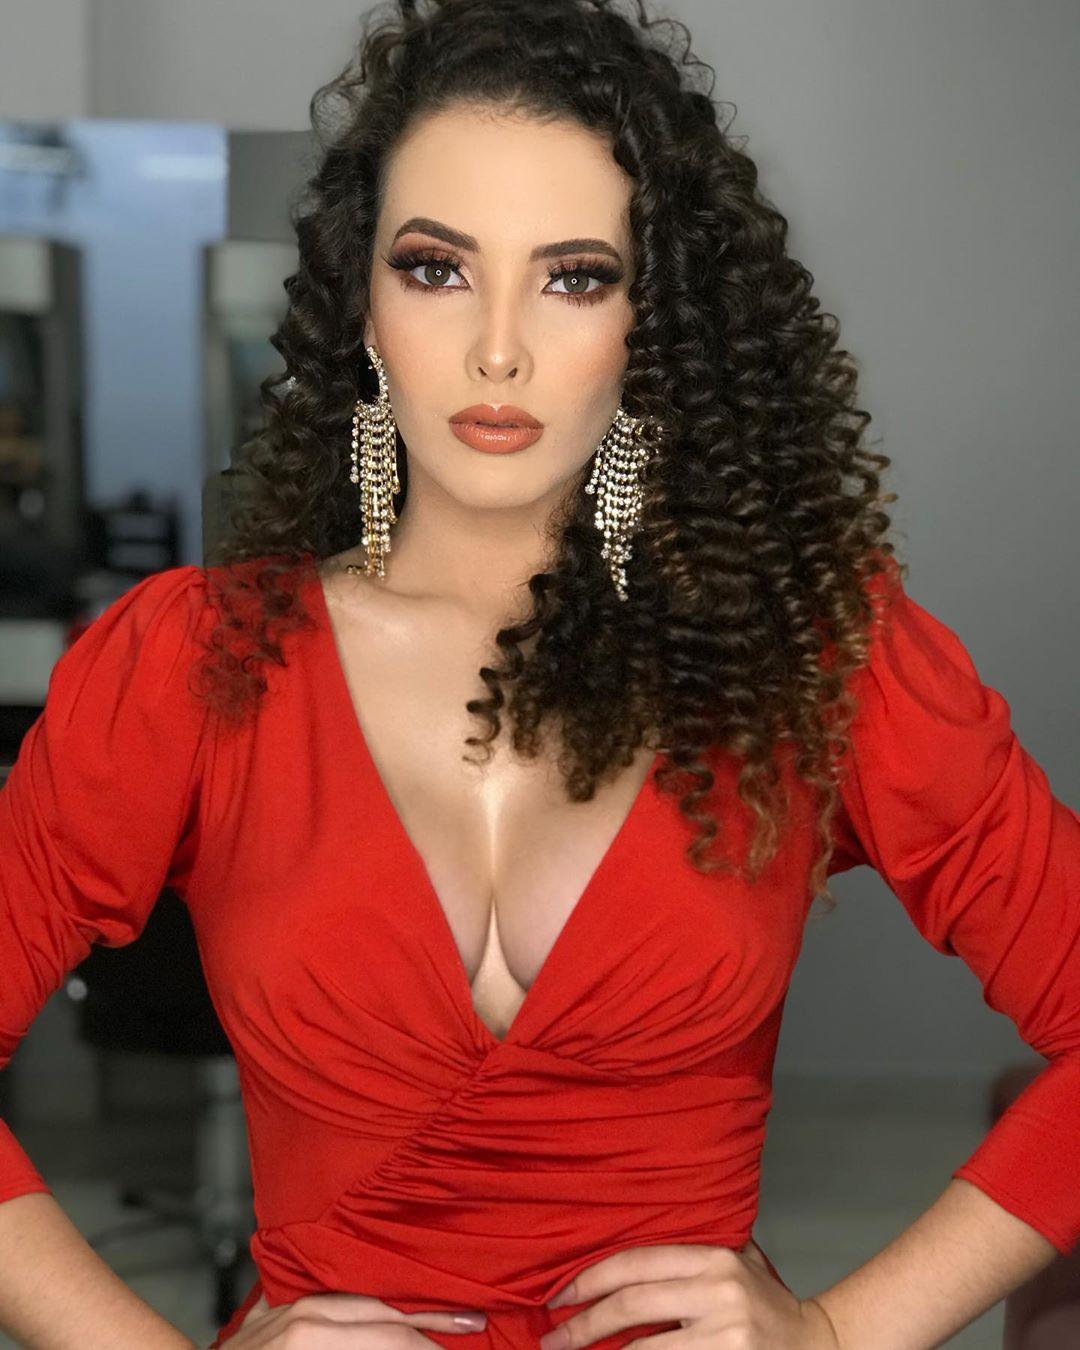 flavia melo, miss maranhao mundo 2020. 89966910